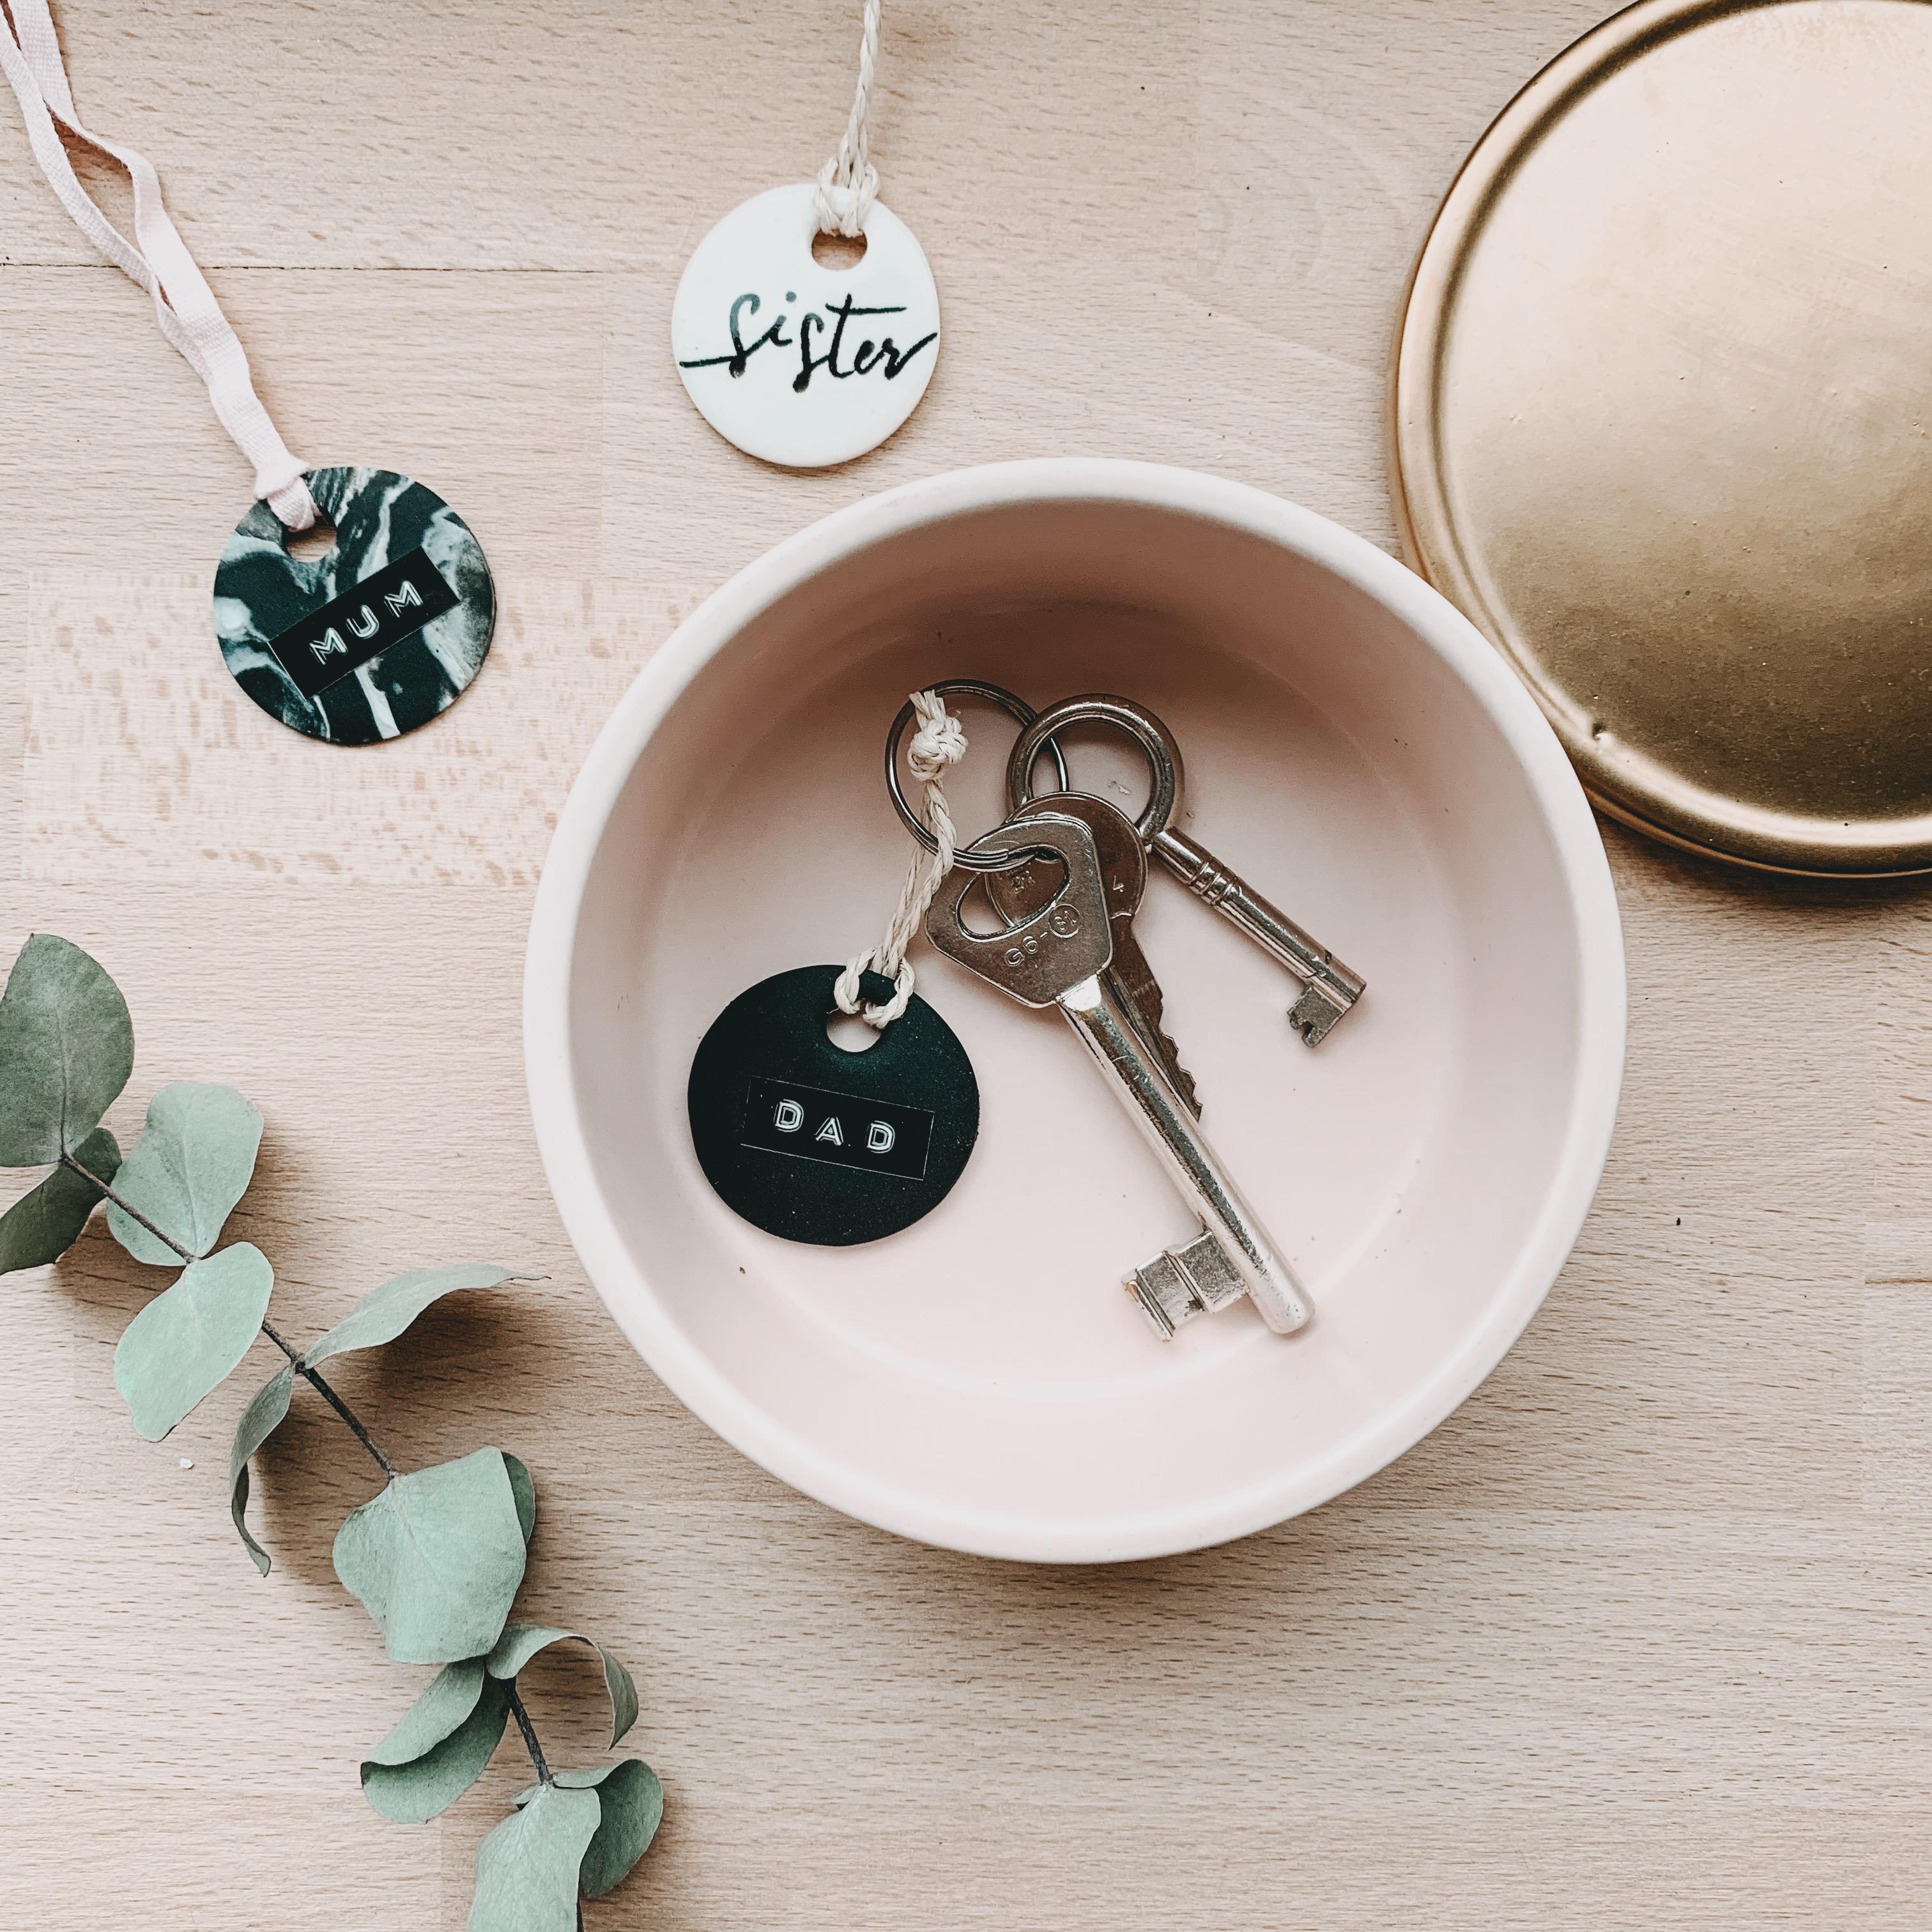 Fimo Schlüsselanhänger DIY Geschenk